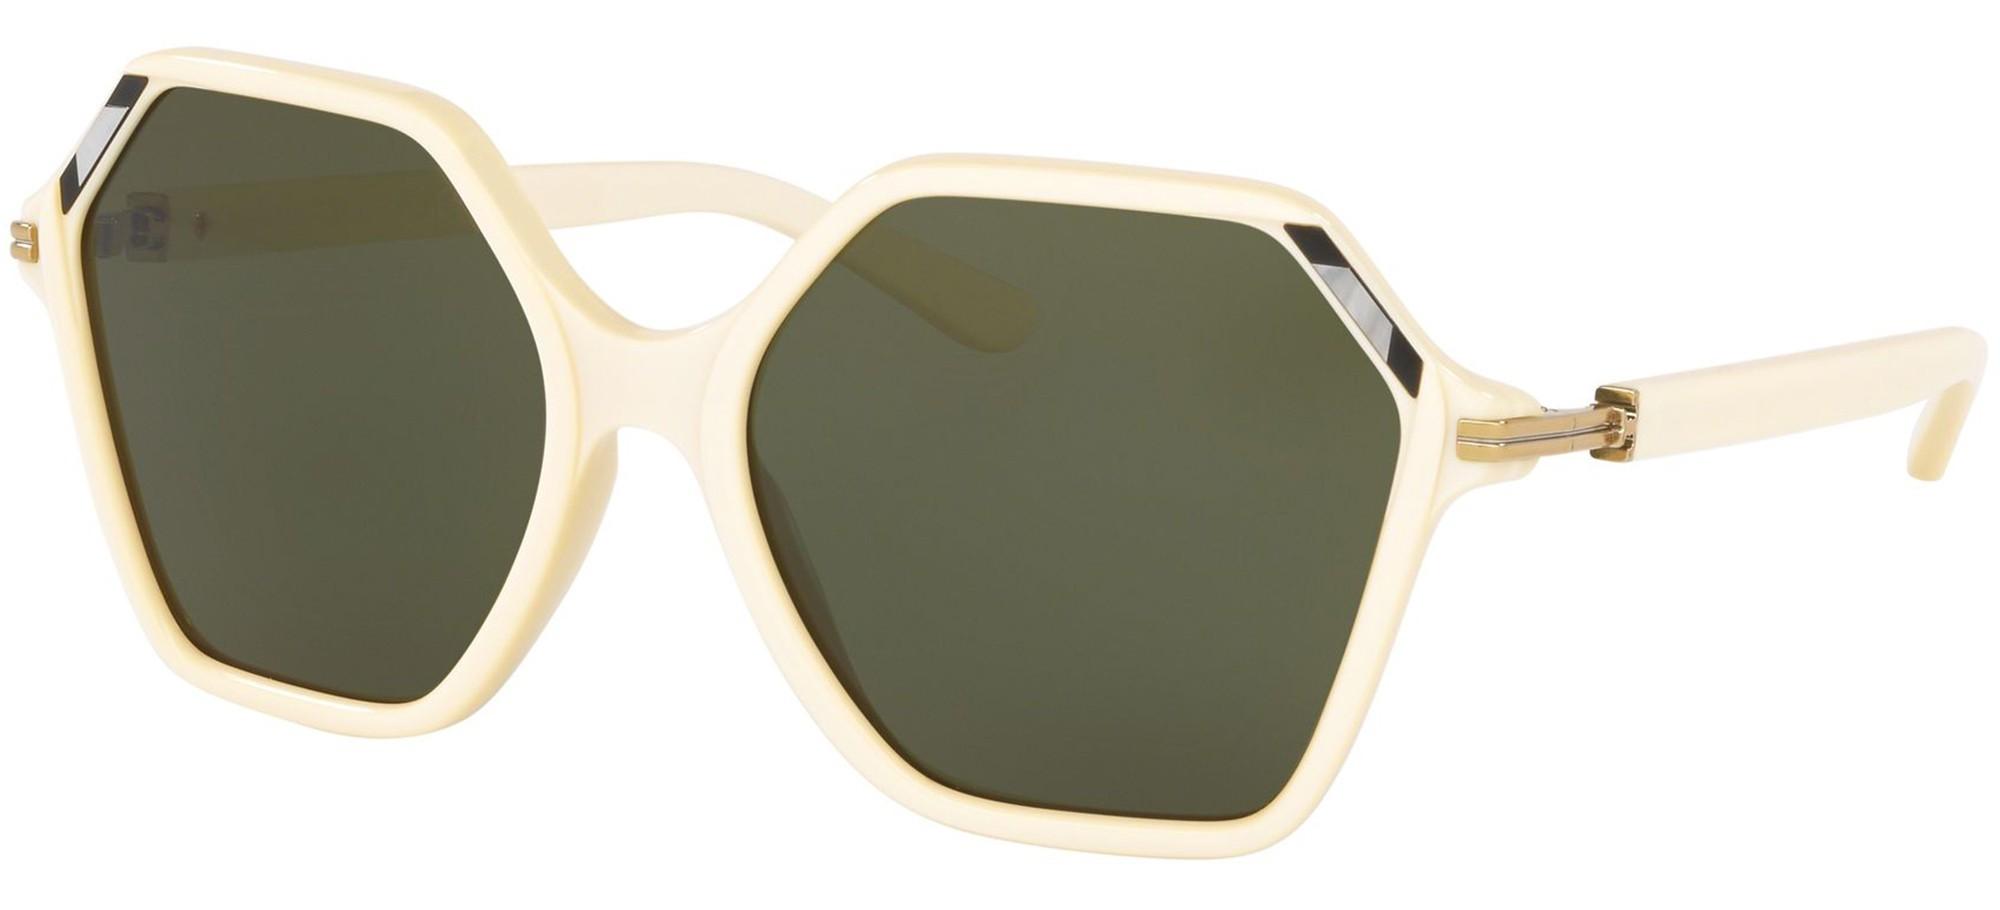 Tory Burch sunglasses TY 7139